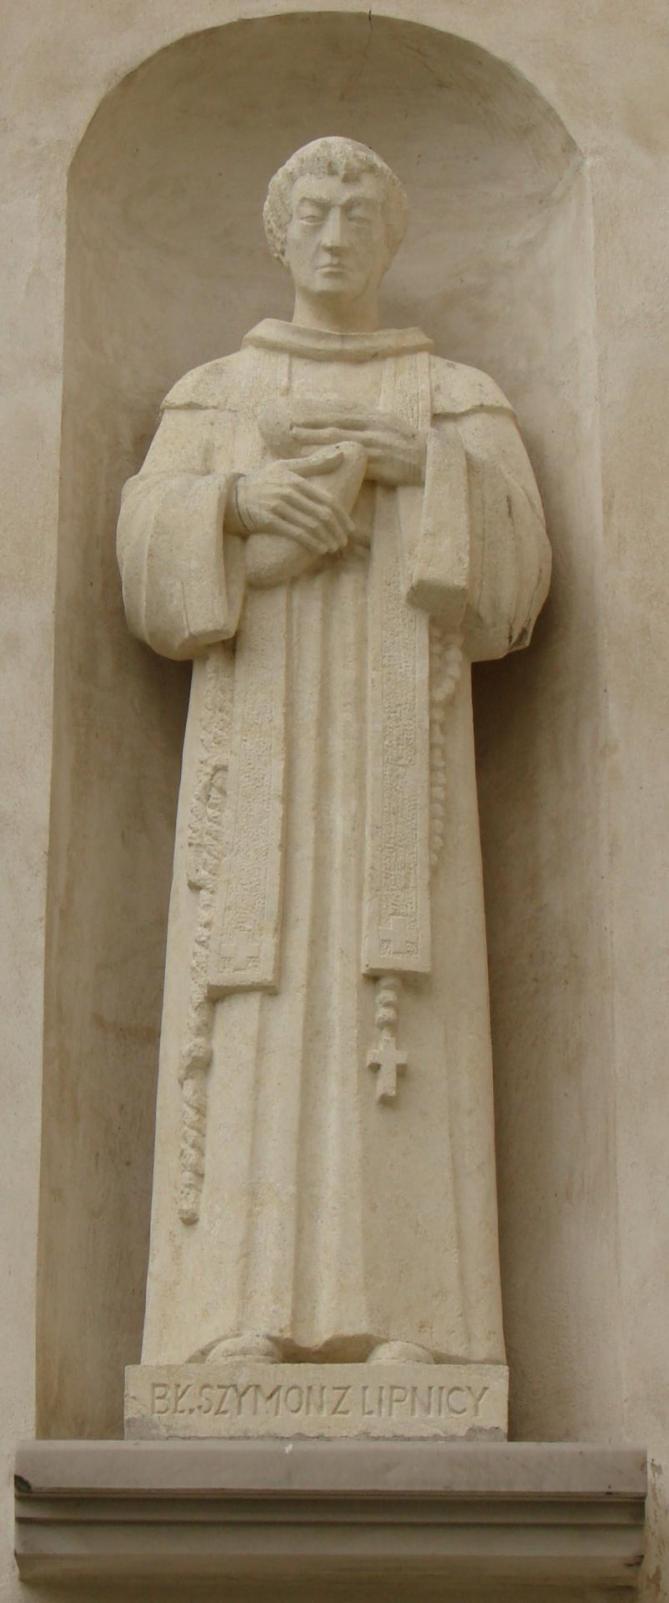 Szymon z lipnicy sculpture